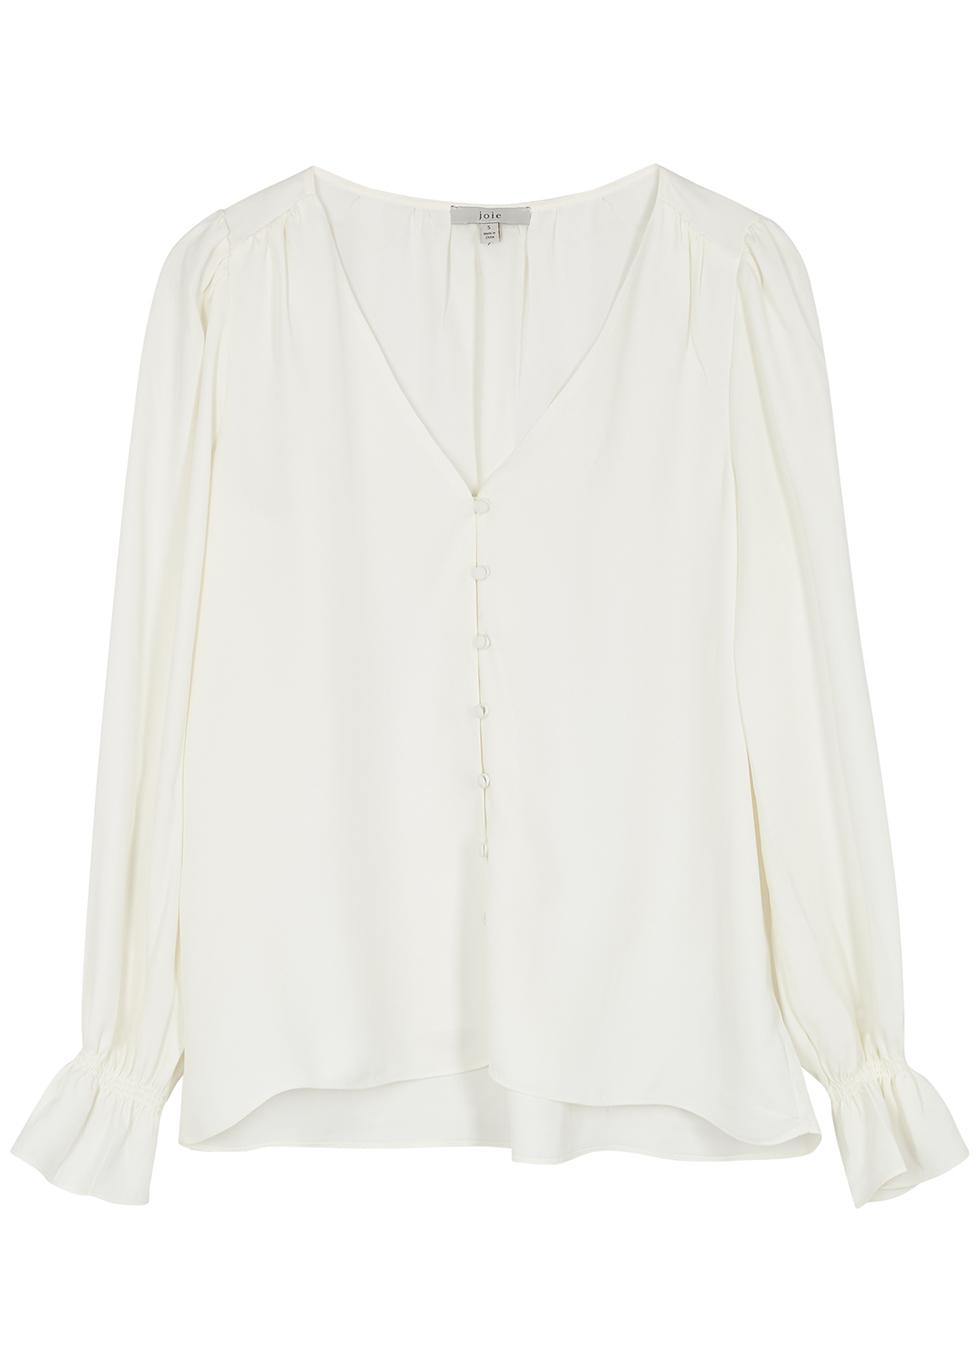 Bolona white blouse